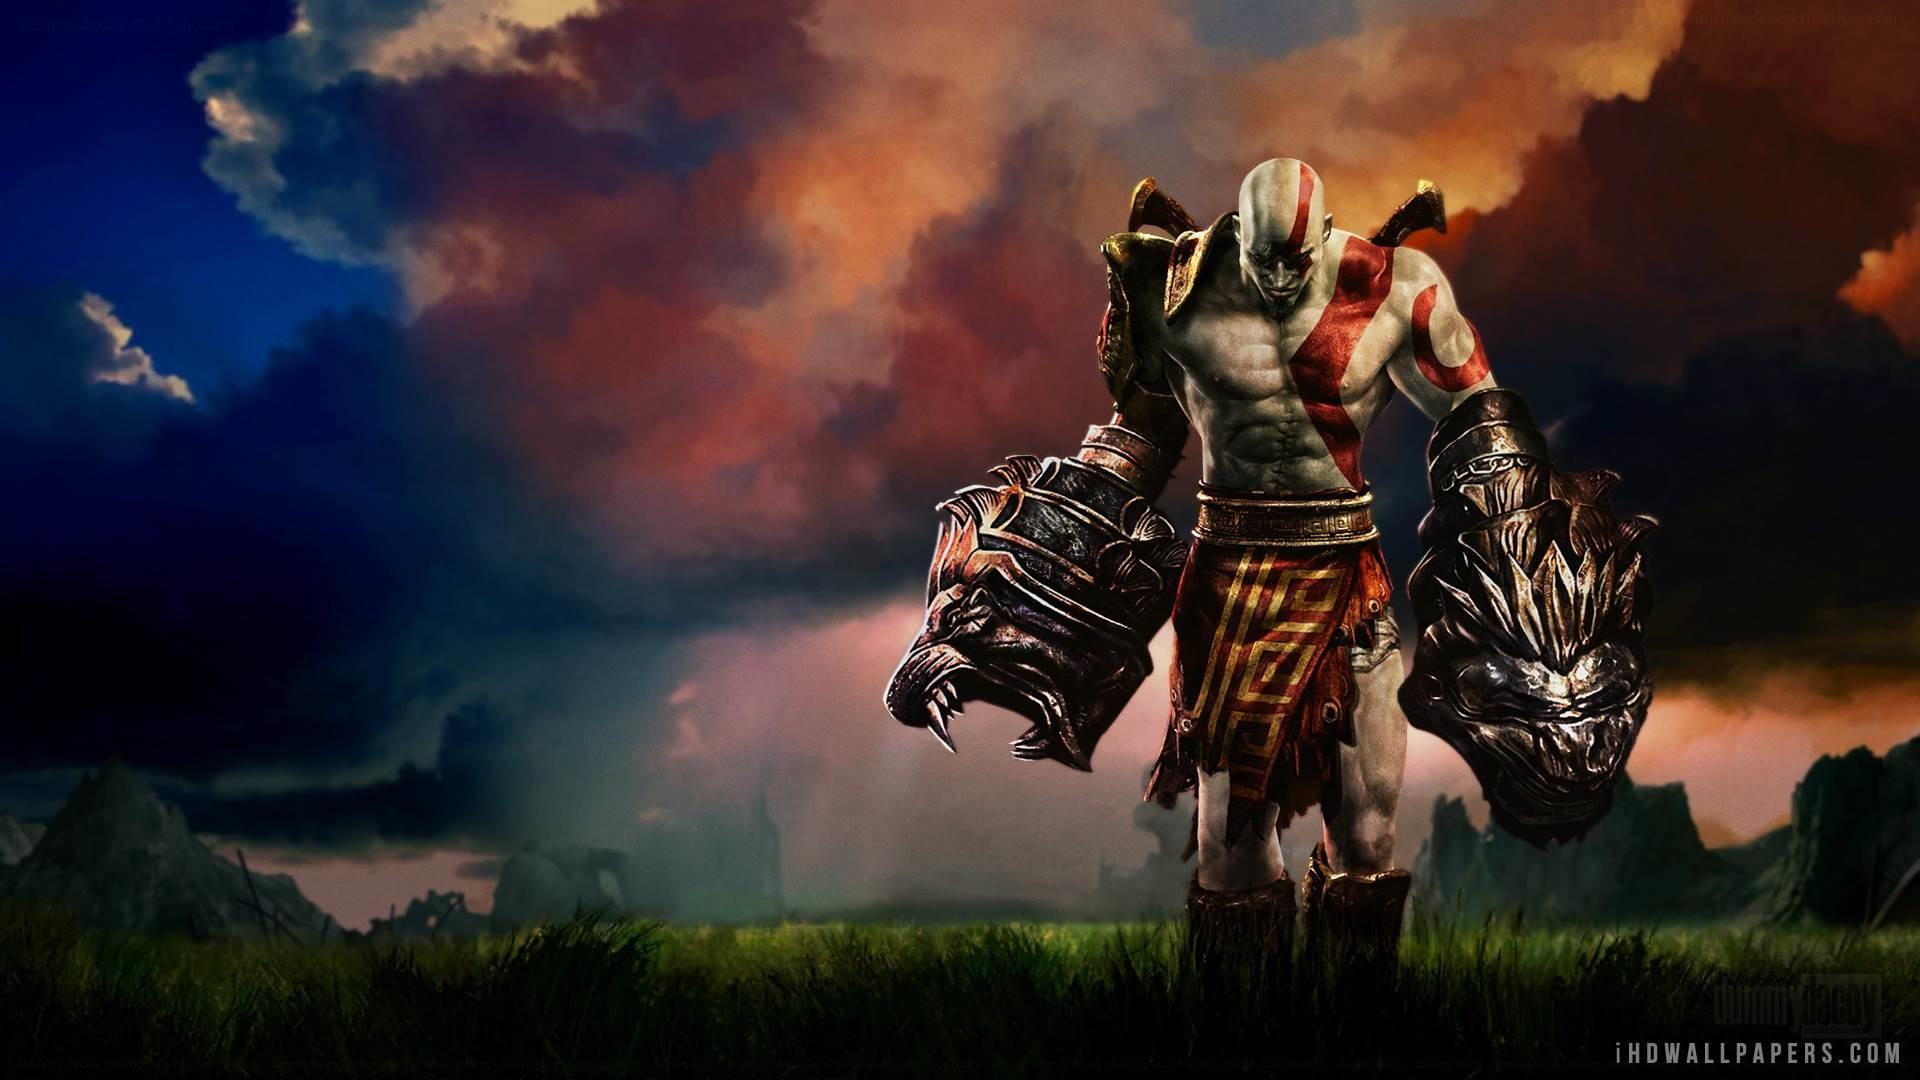 Kratos hd wallpaper wallpapertag - Wallpaper kratos ...